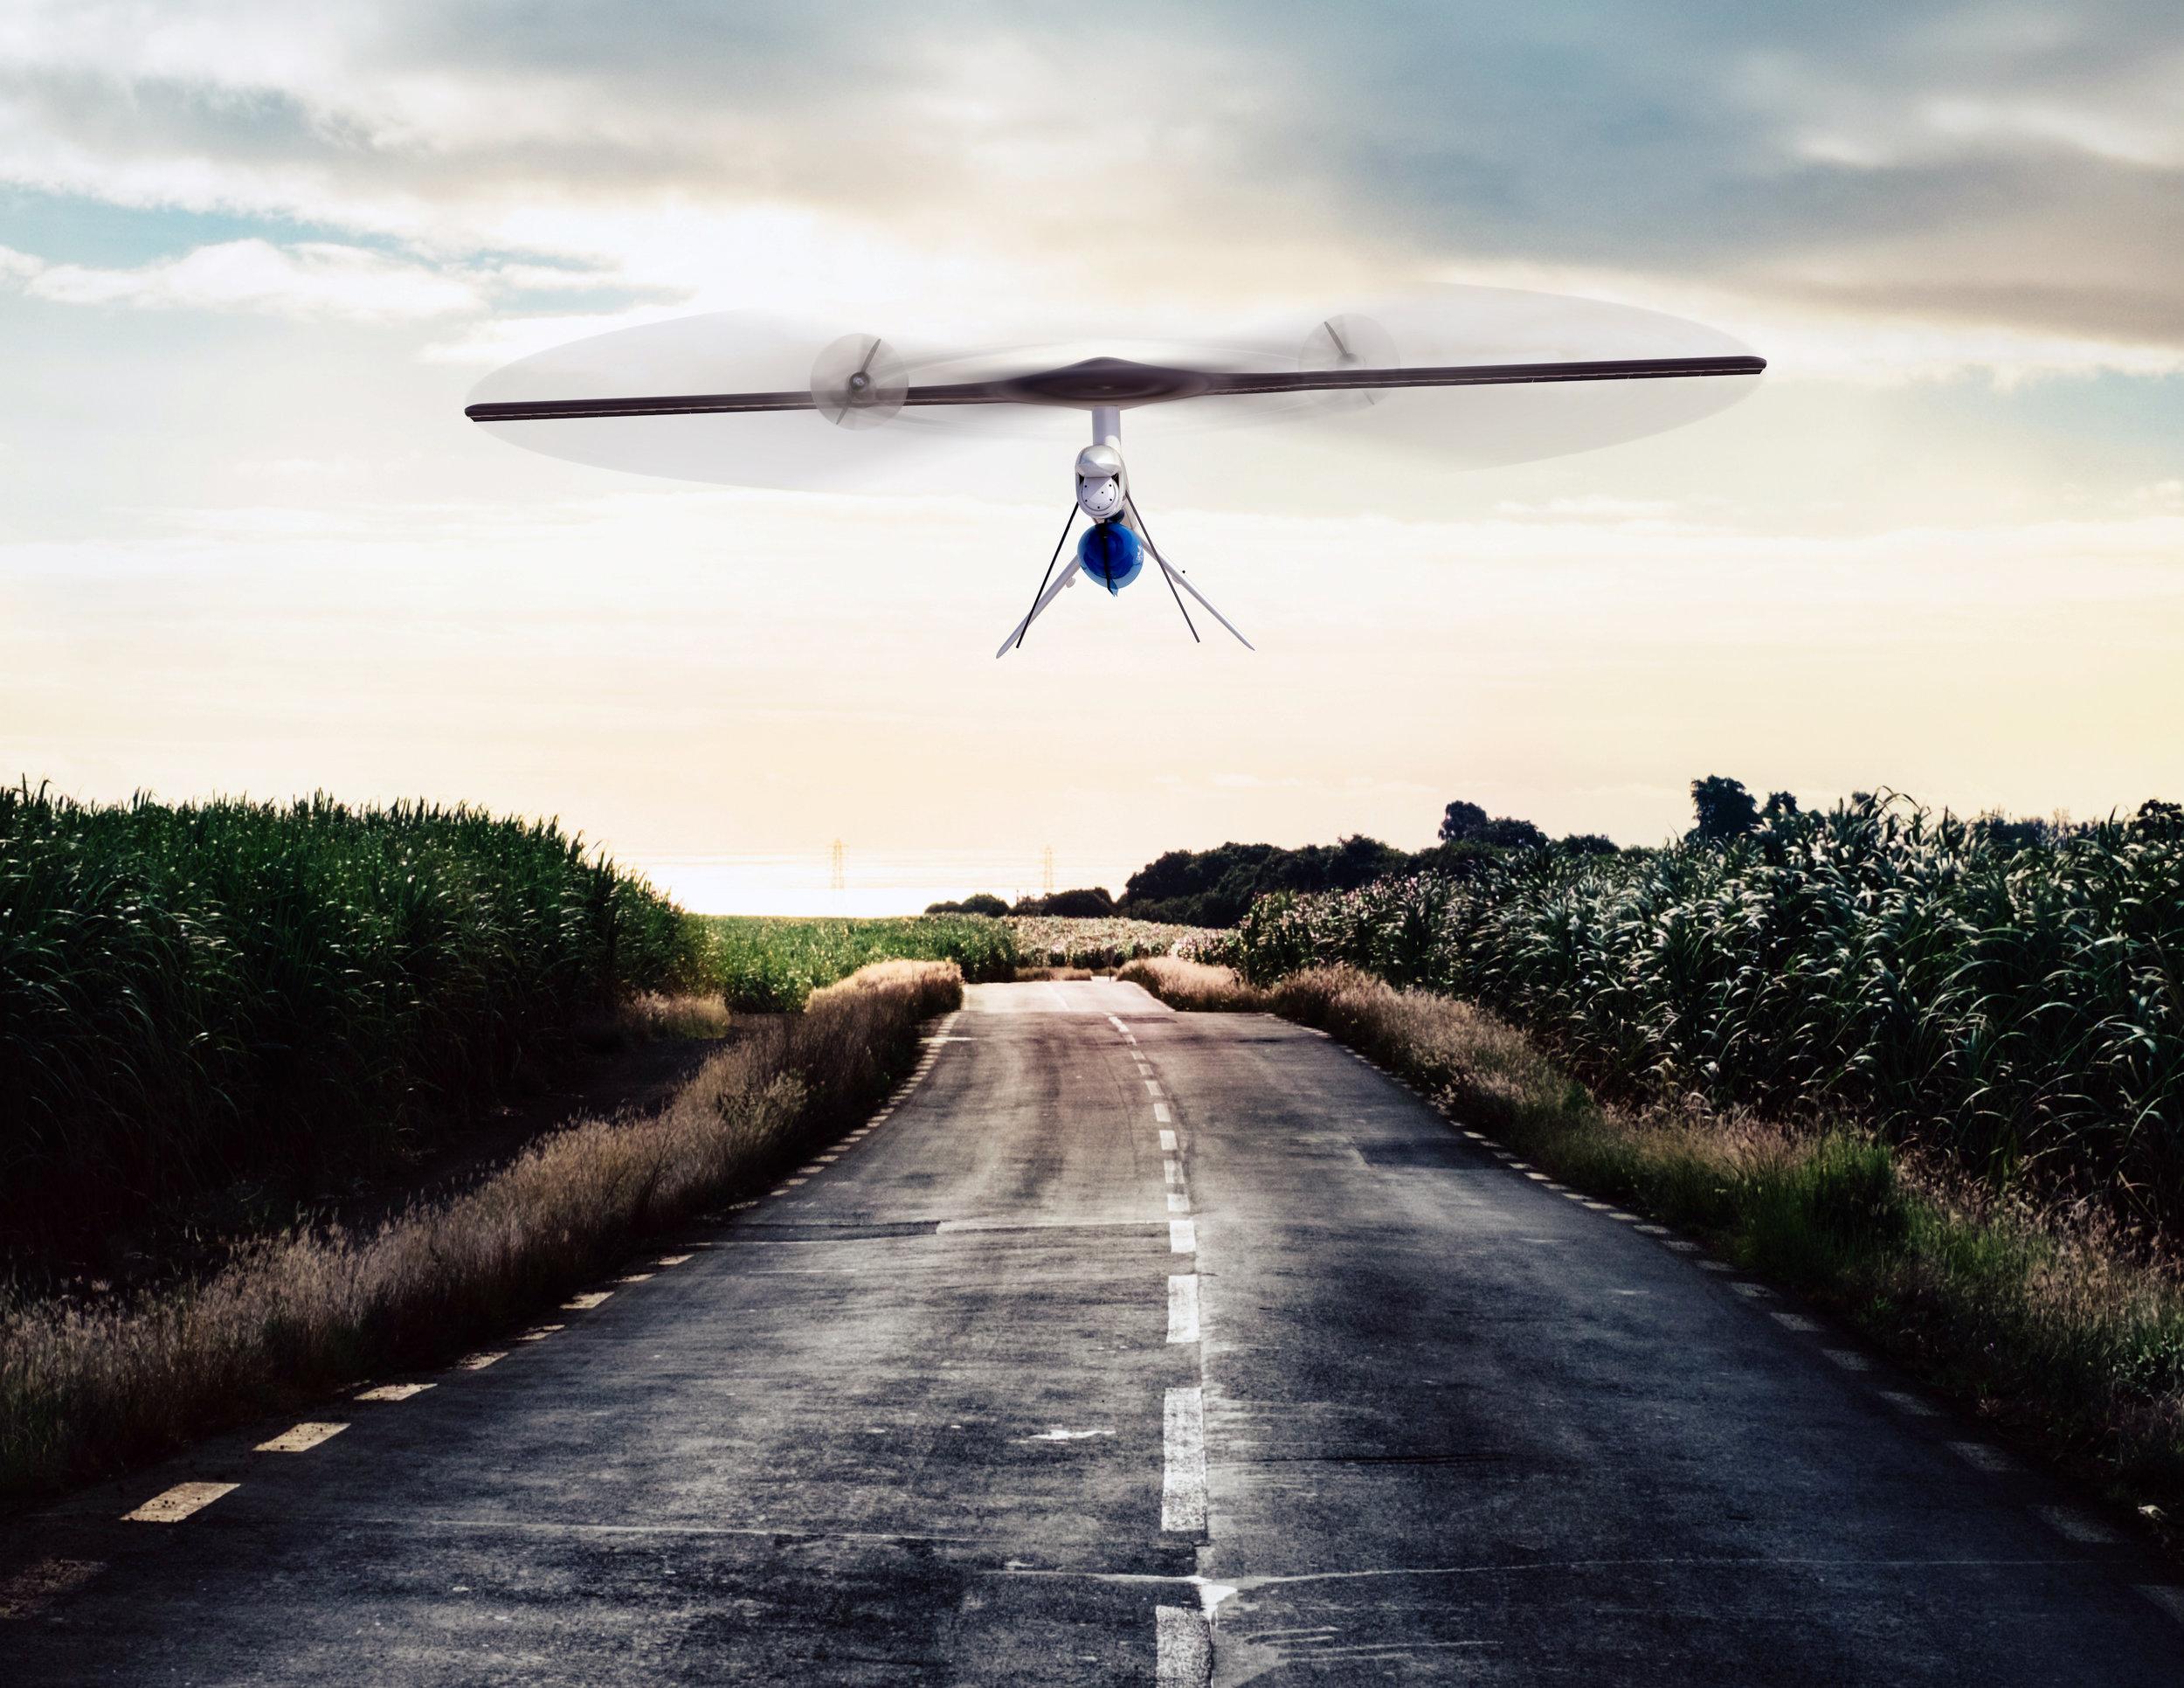 RTW-plate-road-hover-wibg-edit2.jpg